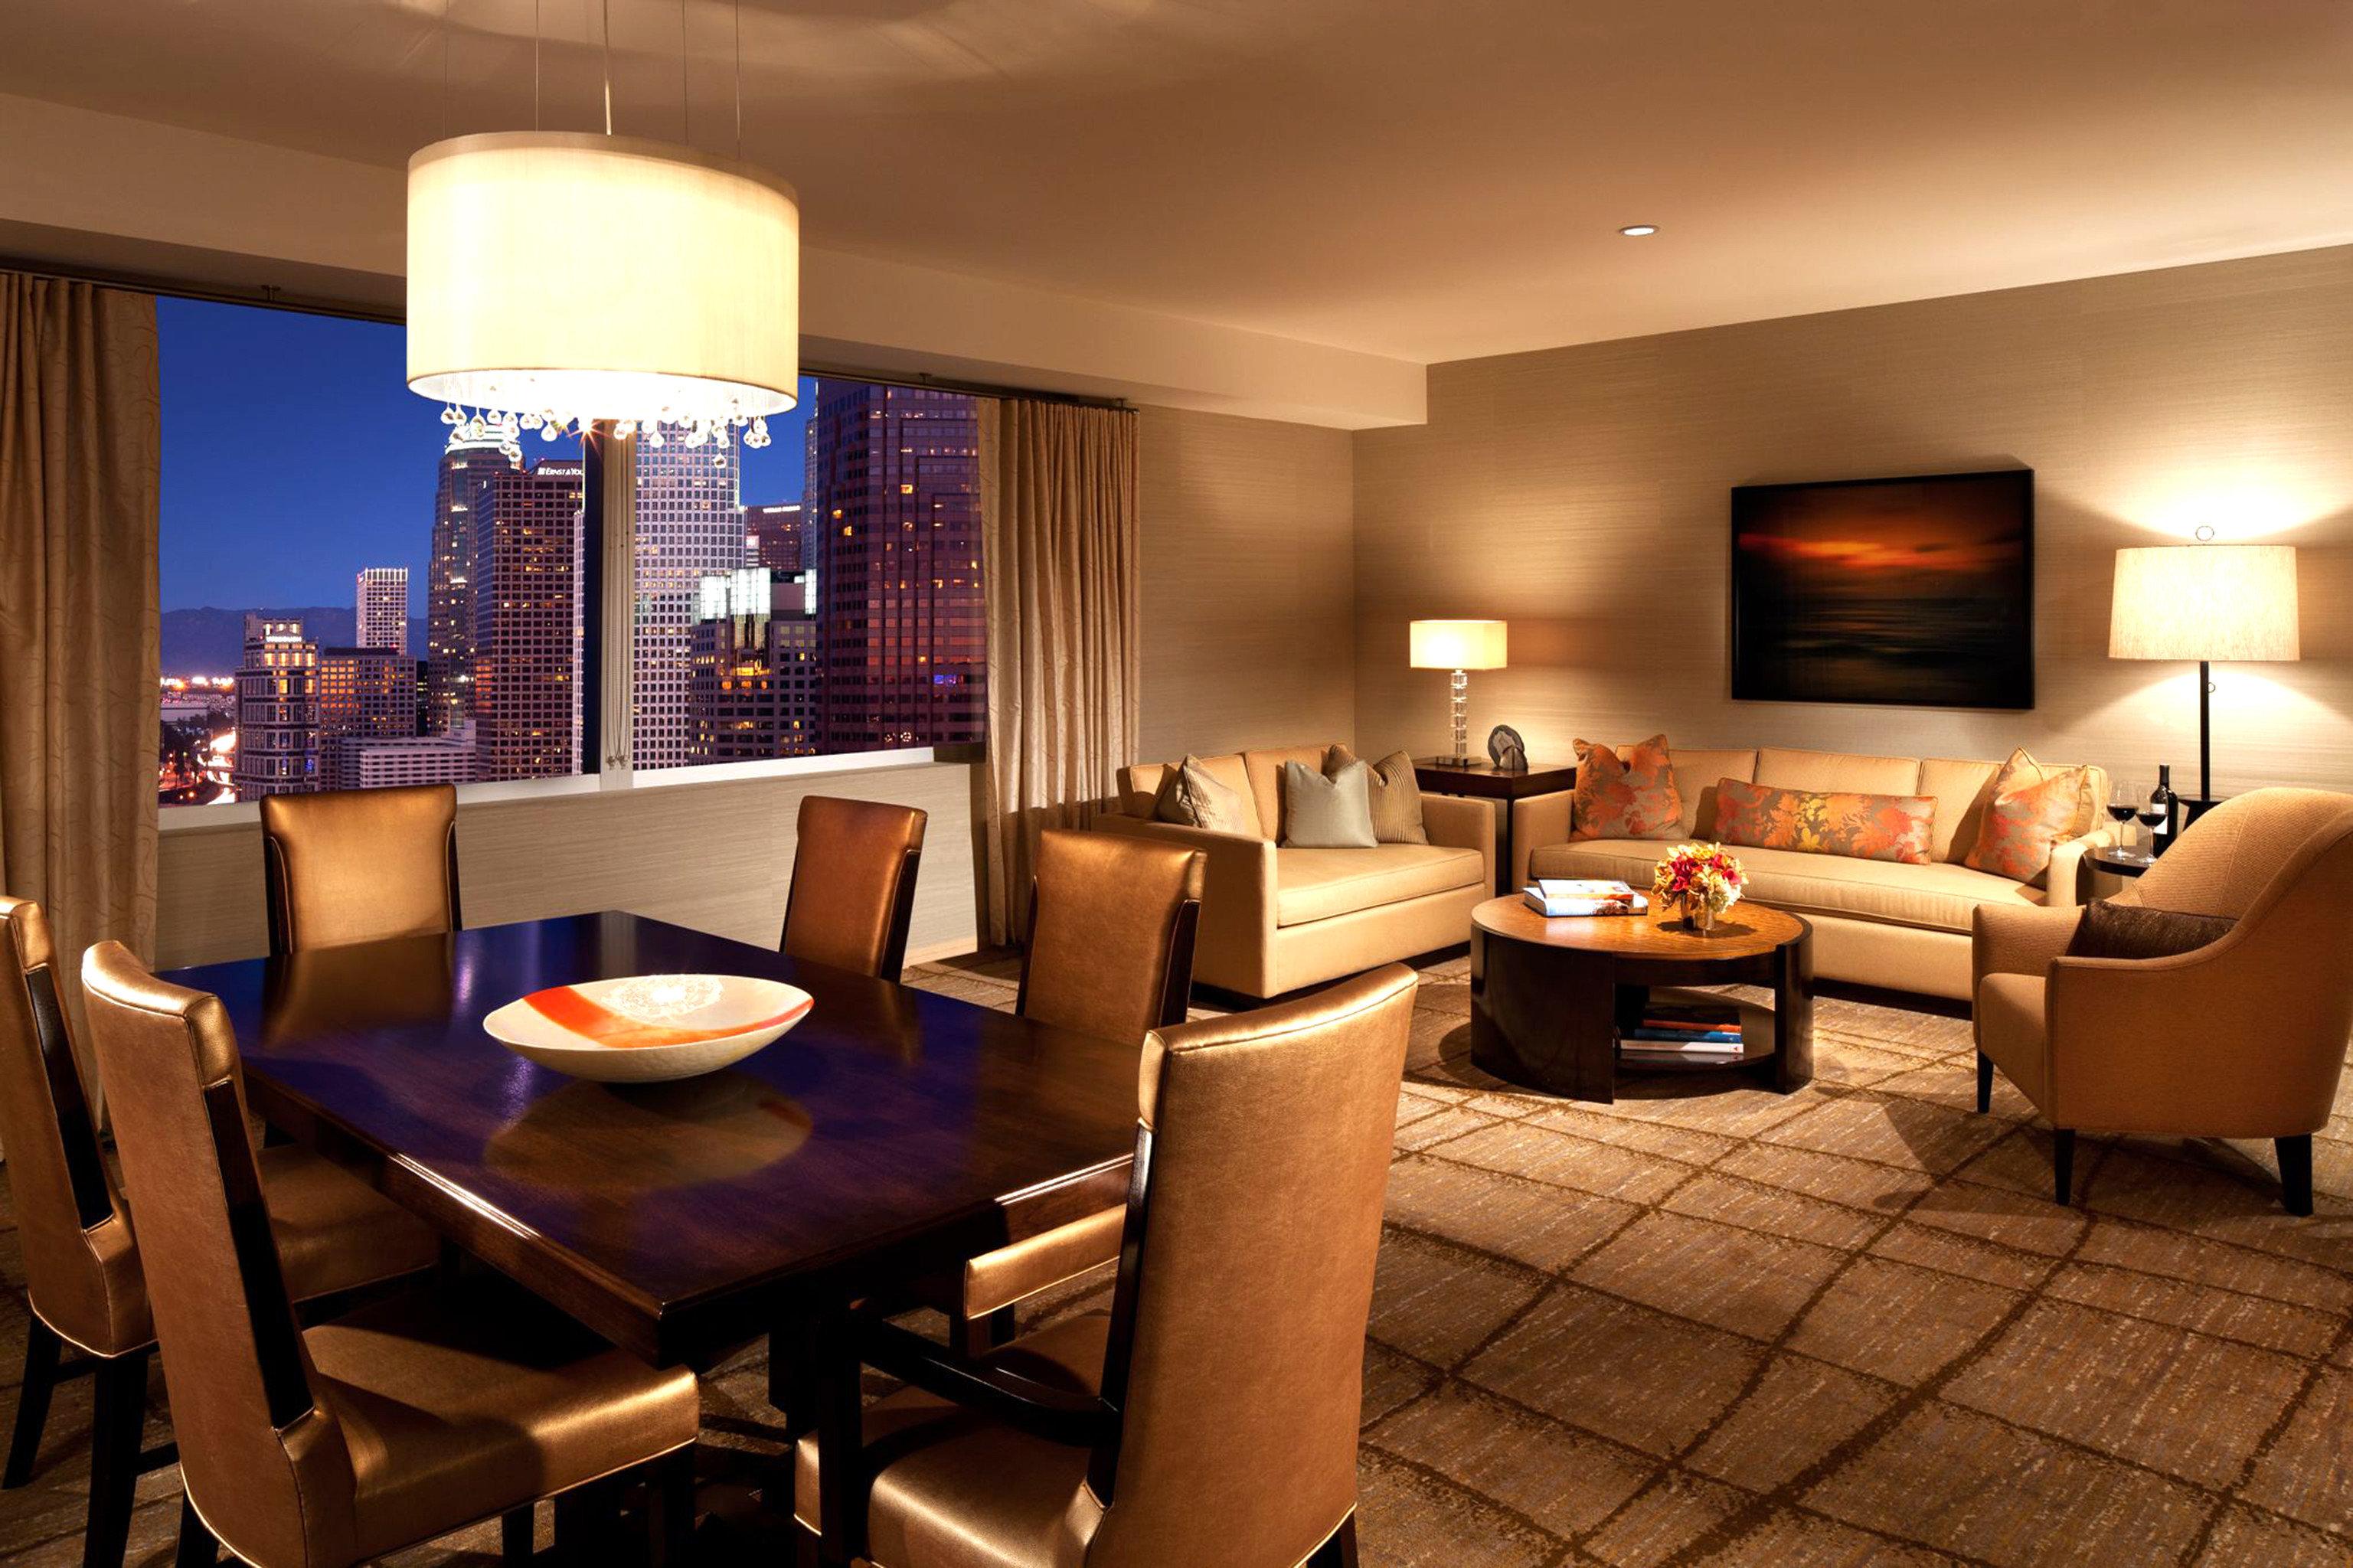 City Elegant Modern Scenic views Suite property chair living room condominium home Lobby recreation room